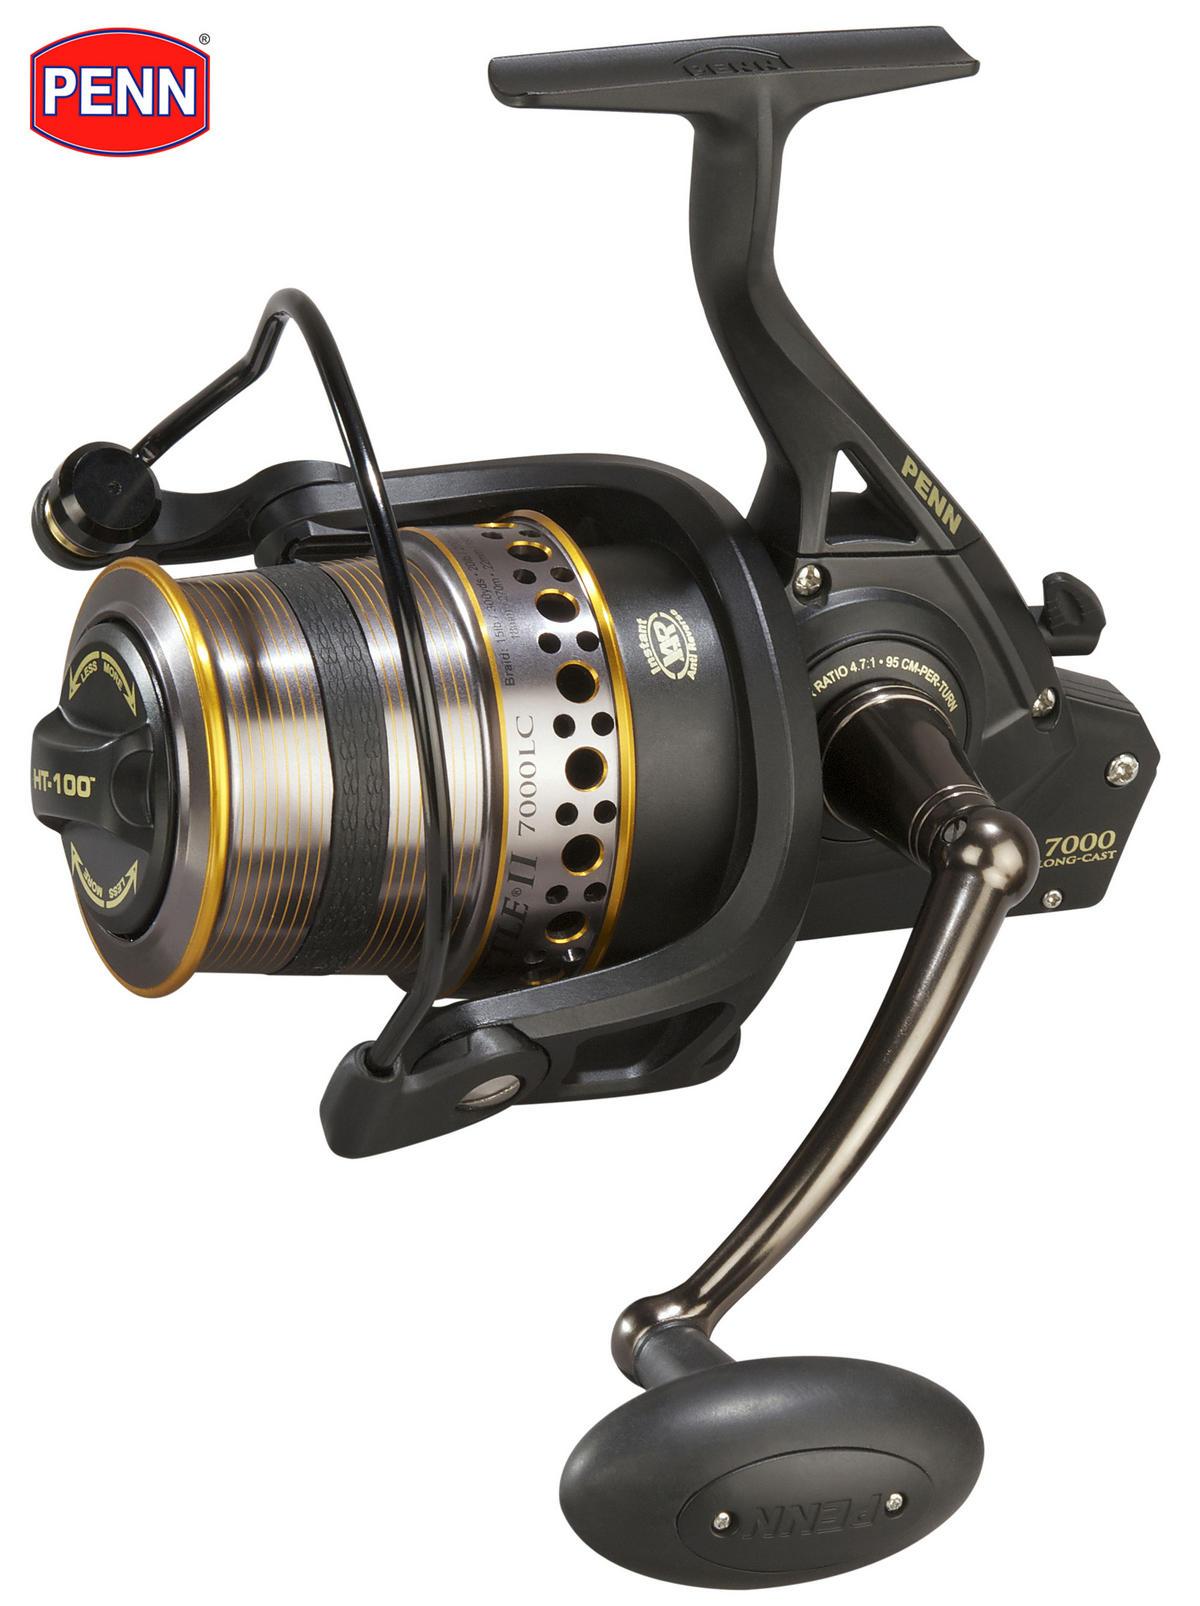 New PENN Battle II 7000 Long Cast Fishing Reel Model No. BTL7000LCEU